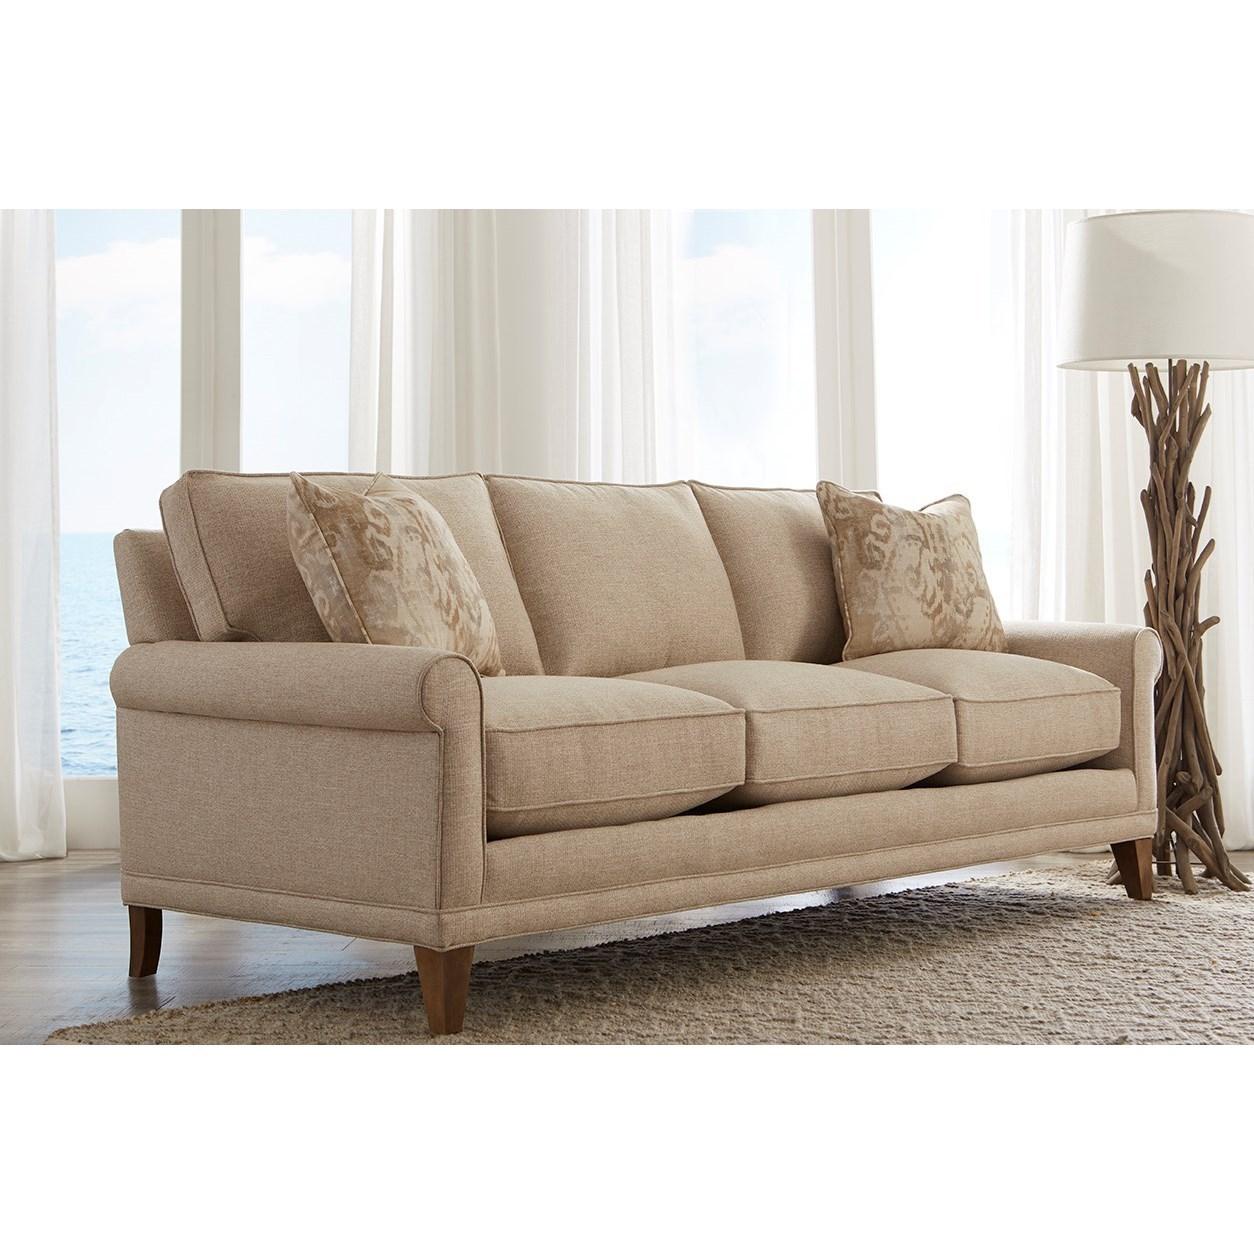 My Style II Customizable Sofa Sleeper by Rowe at Sprintz Furniture